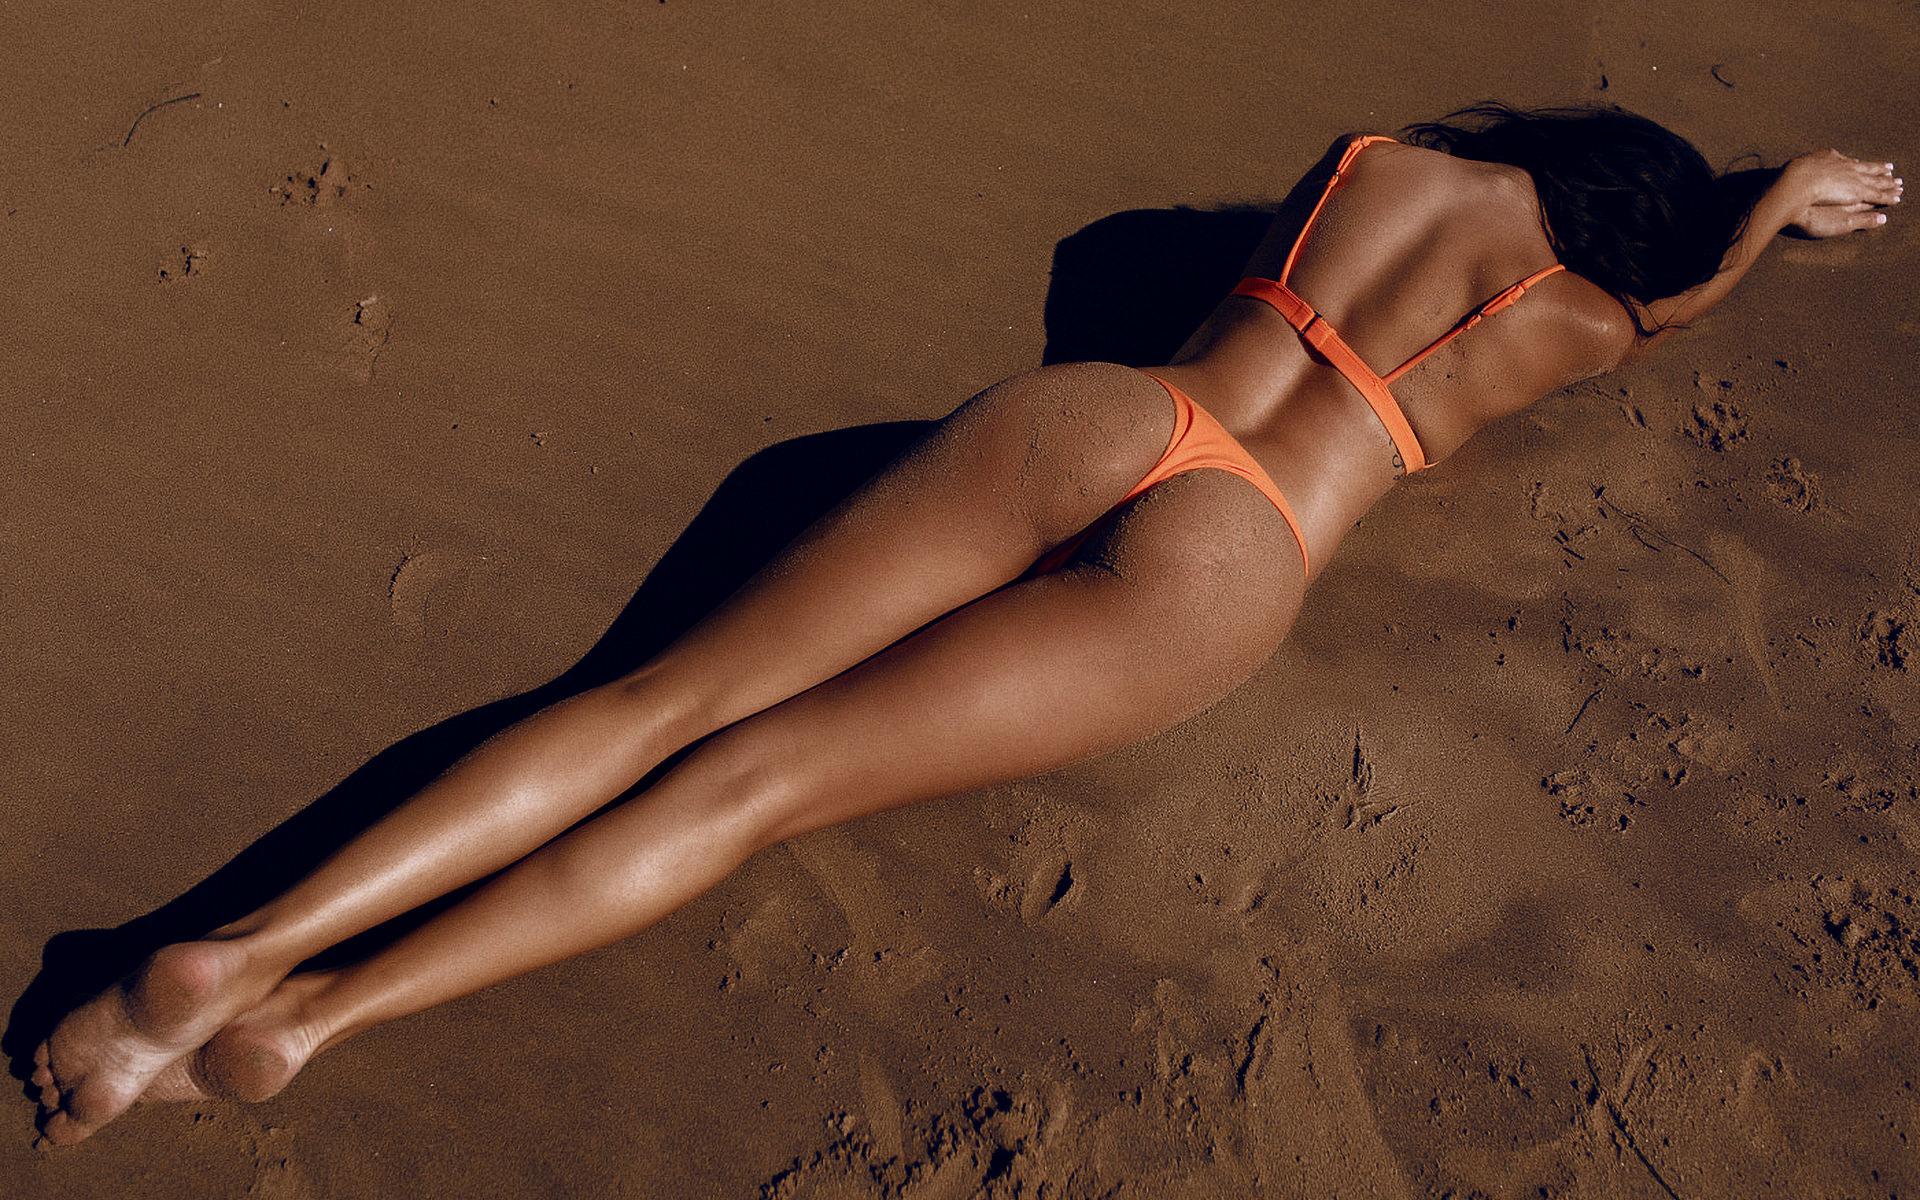 длинные ножки бикини фото общие советы